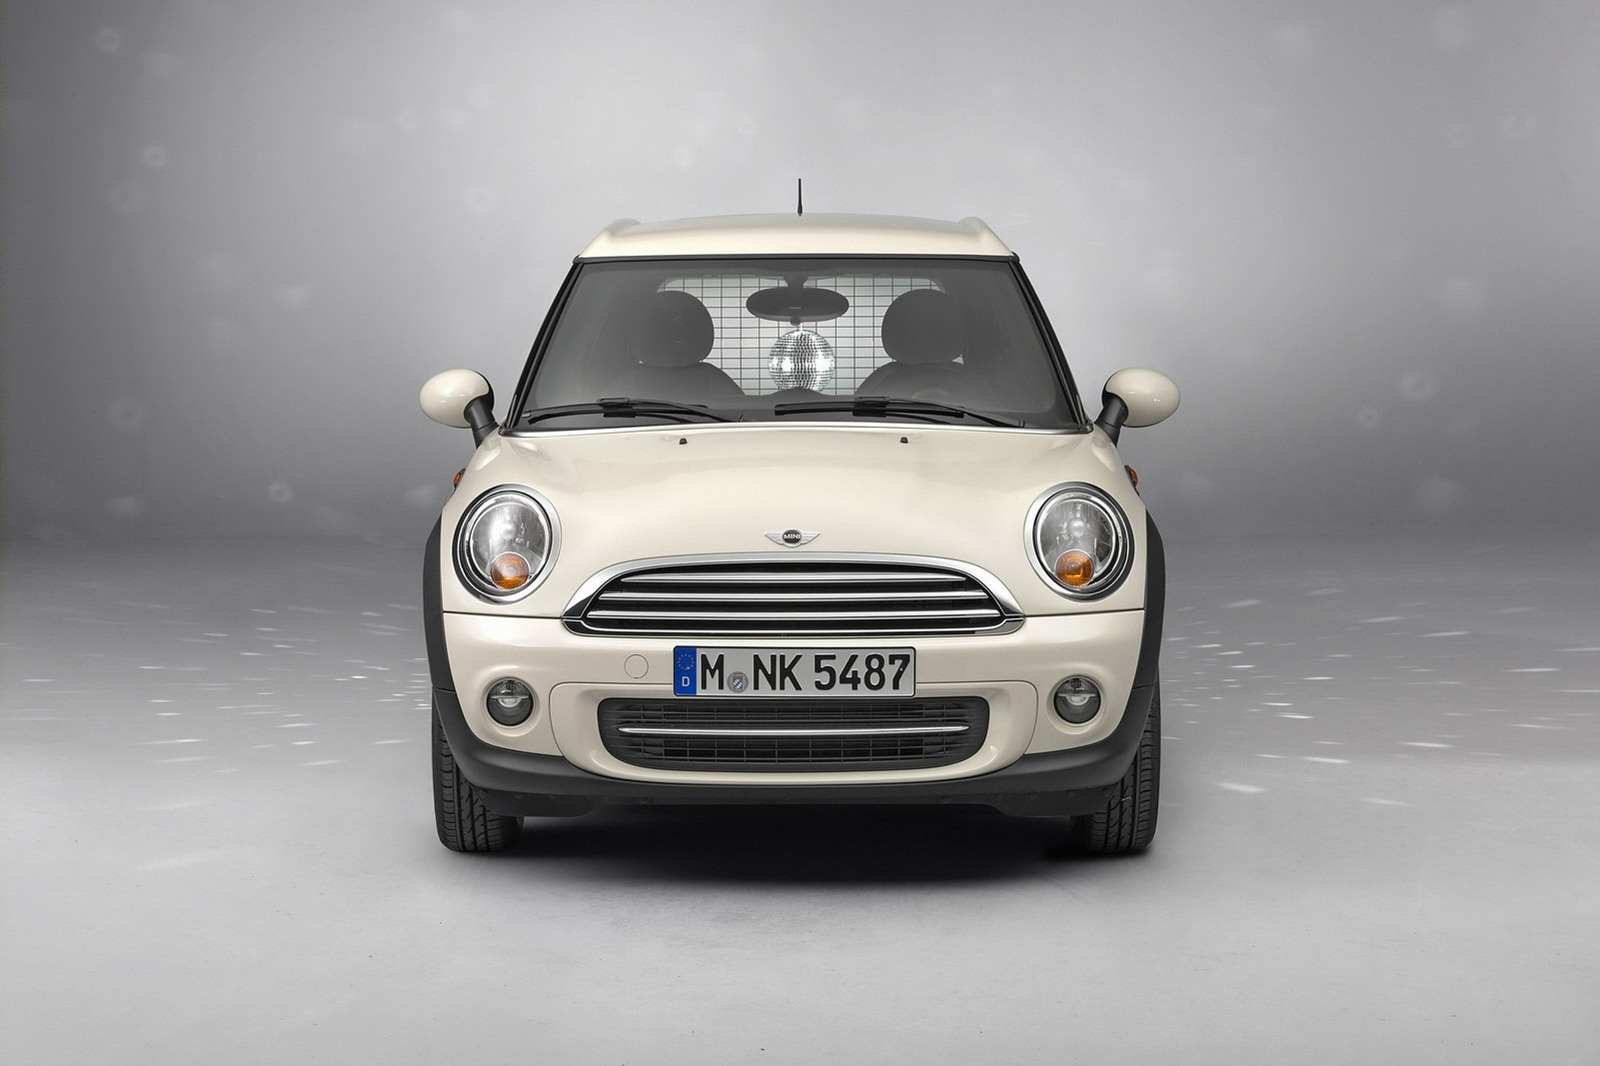 2013-Mini-Clubvan-Production-Model-13.jpg?imgmax=1800